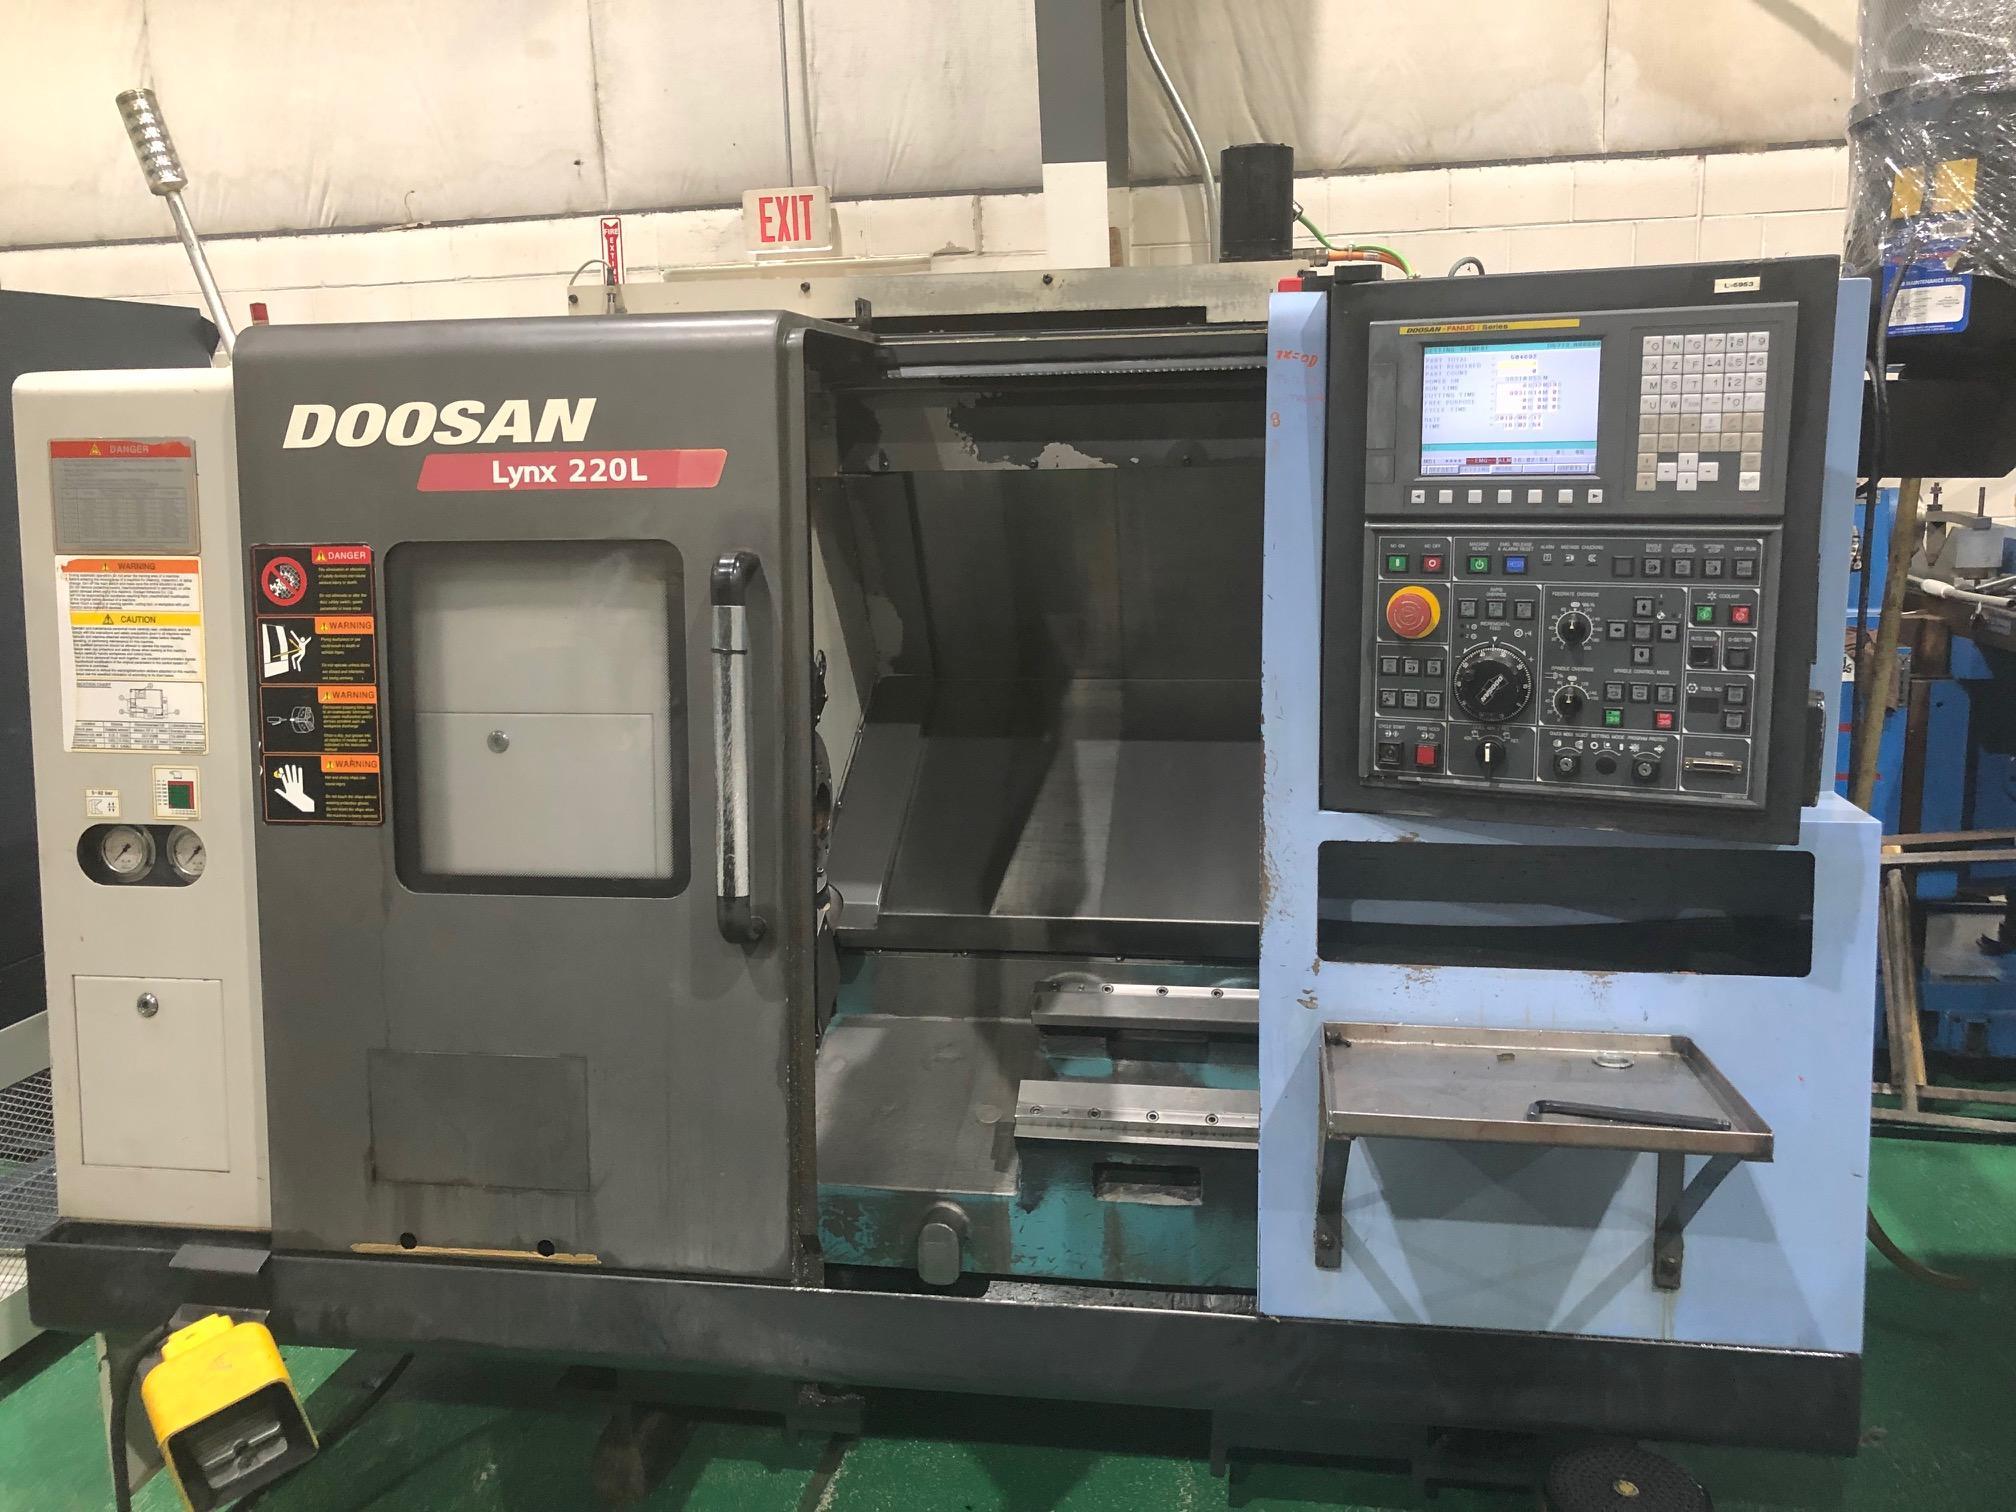 2013 DOOSAN Lynx 220LC - CNC Horizontal Lathe